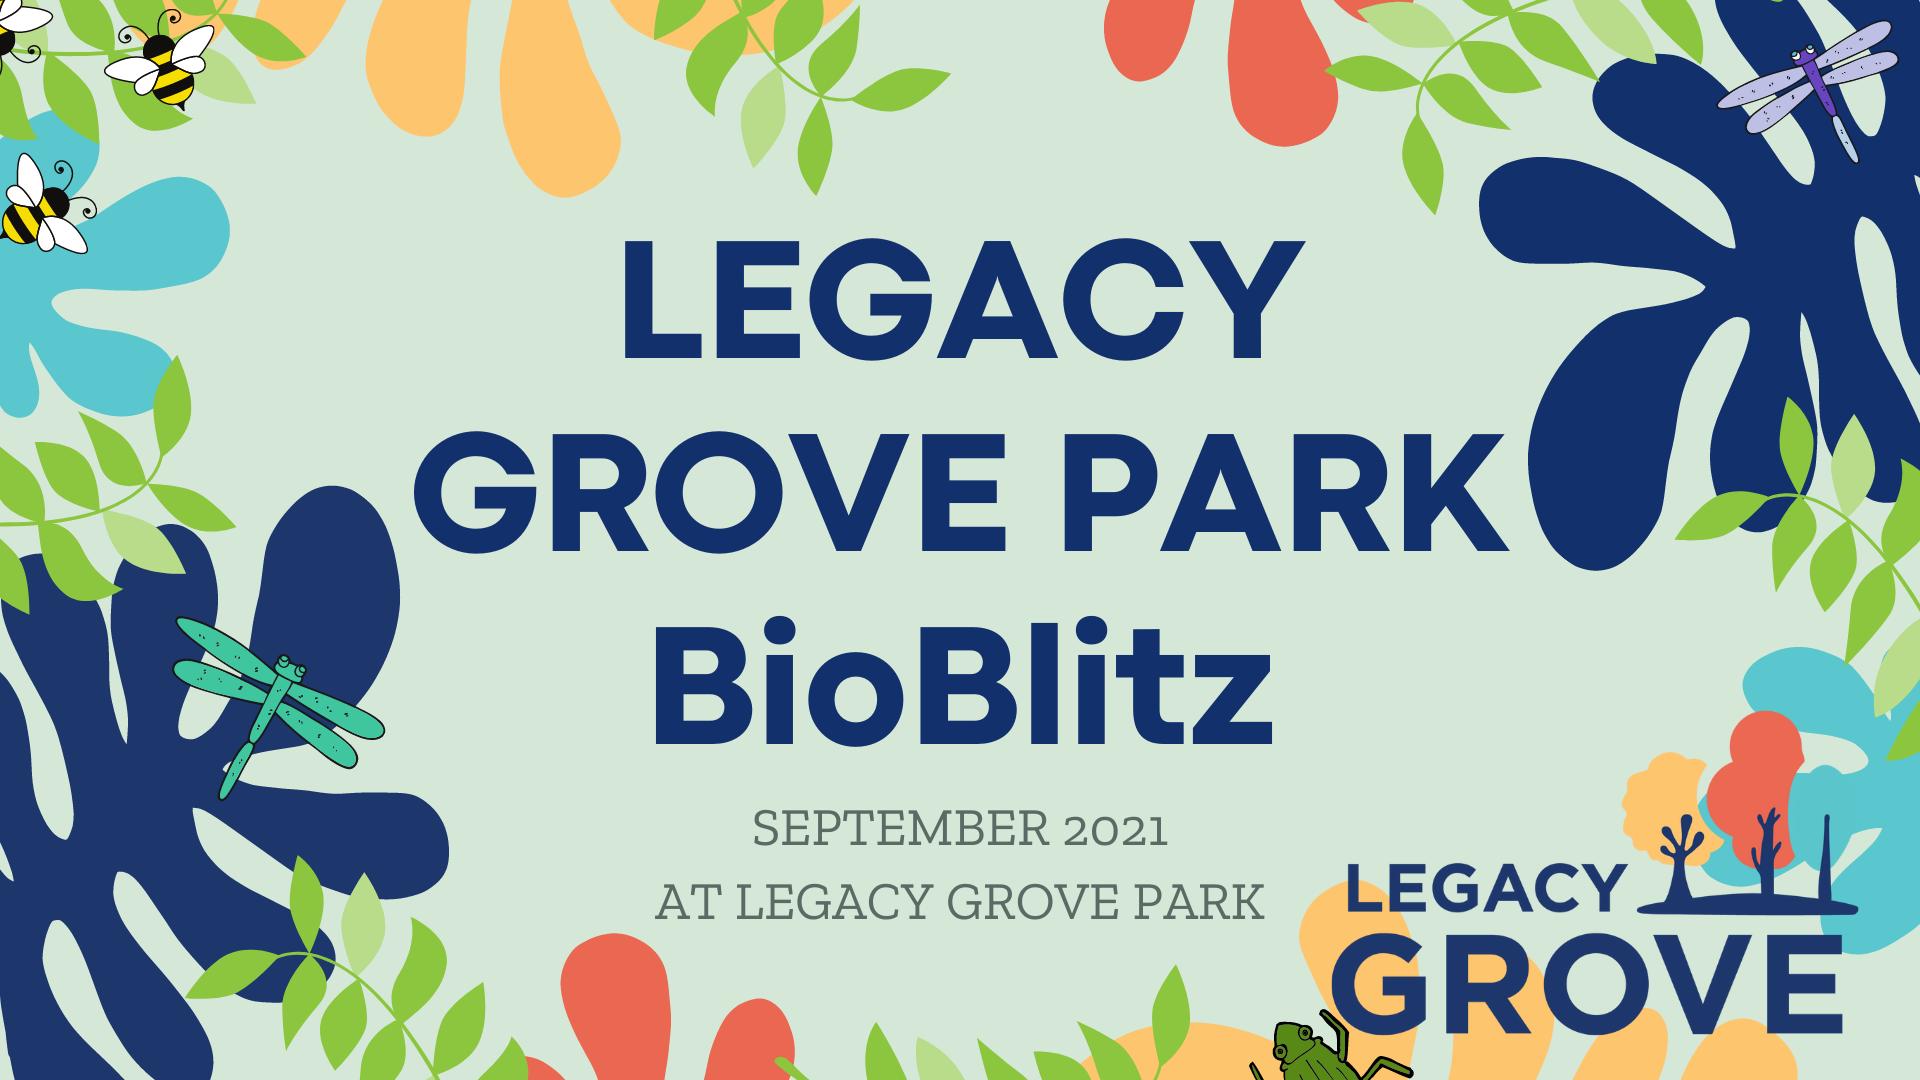 Legacy Grove Park BioBlitz Banner